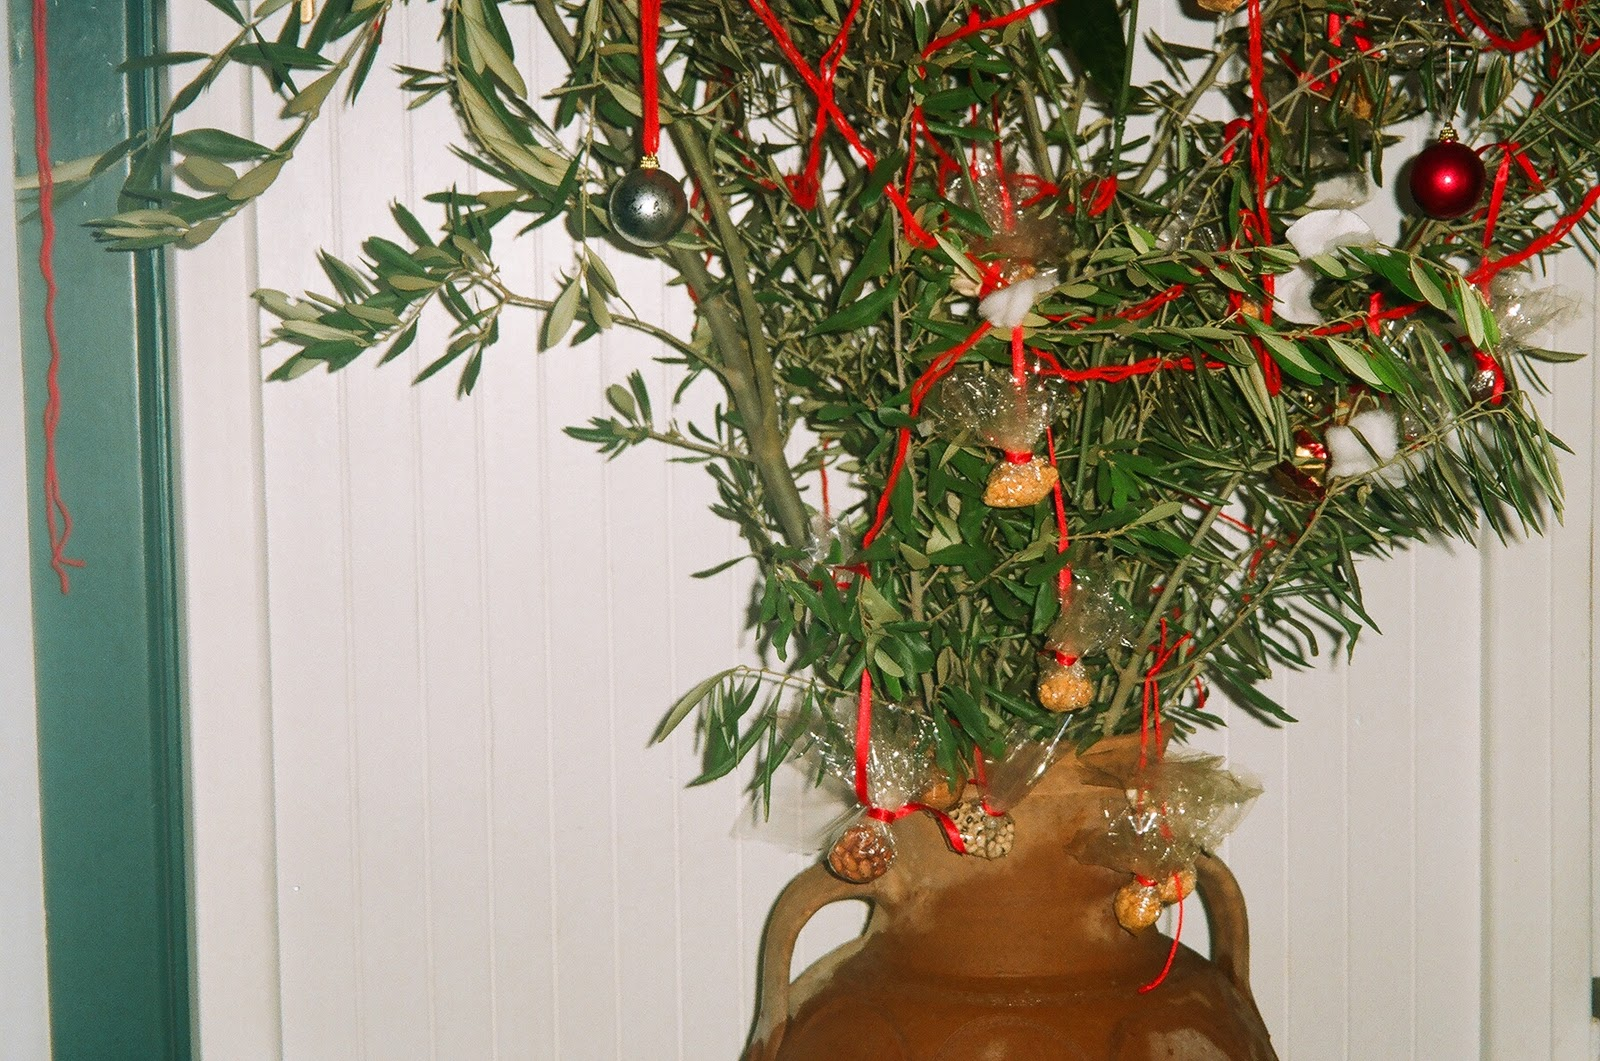 diaforetiko.gr :  Αυτό ήταν το χριστουγεννιάτικο δέντρο της αρχαίας Ελλάδας!